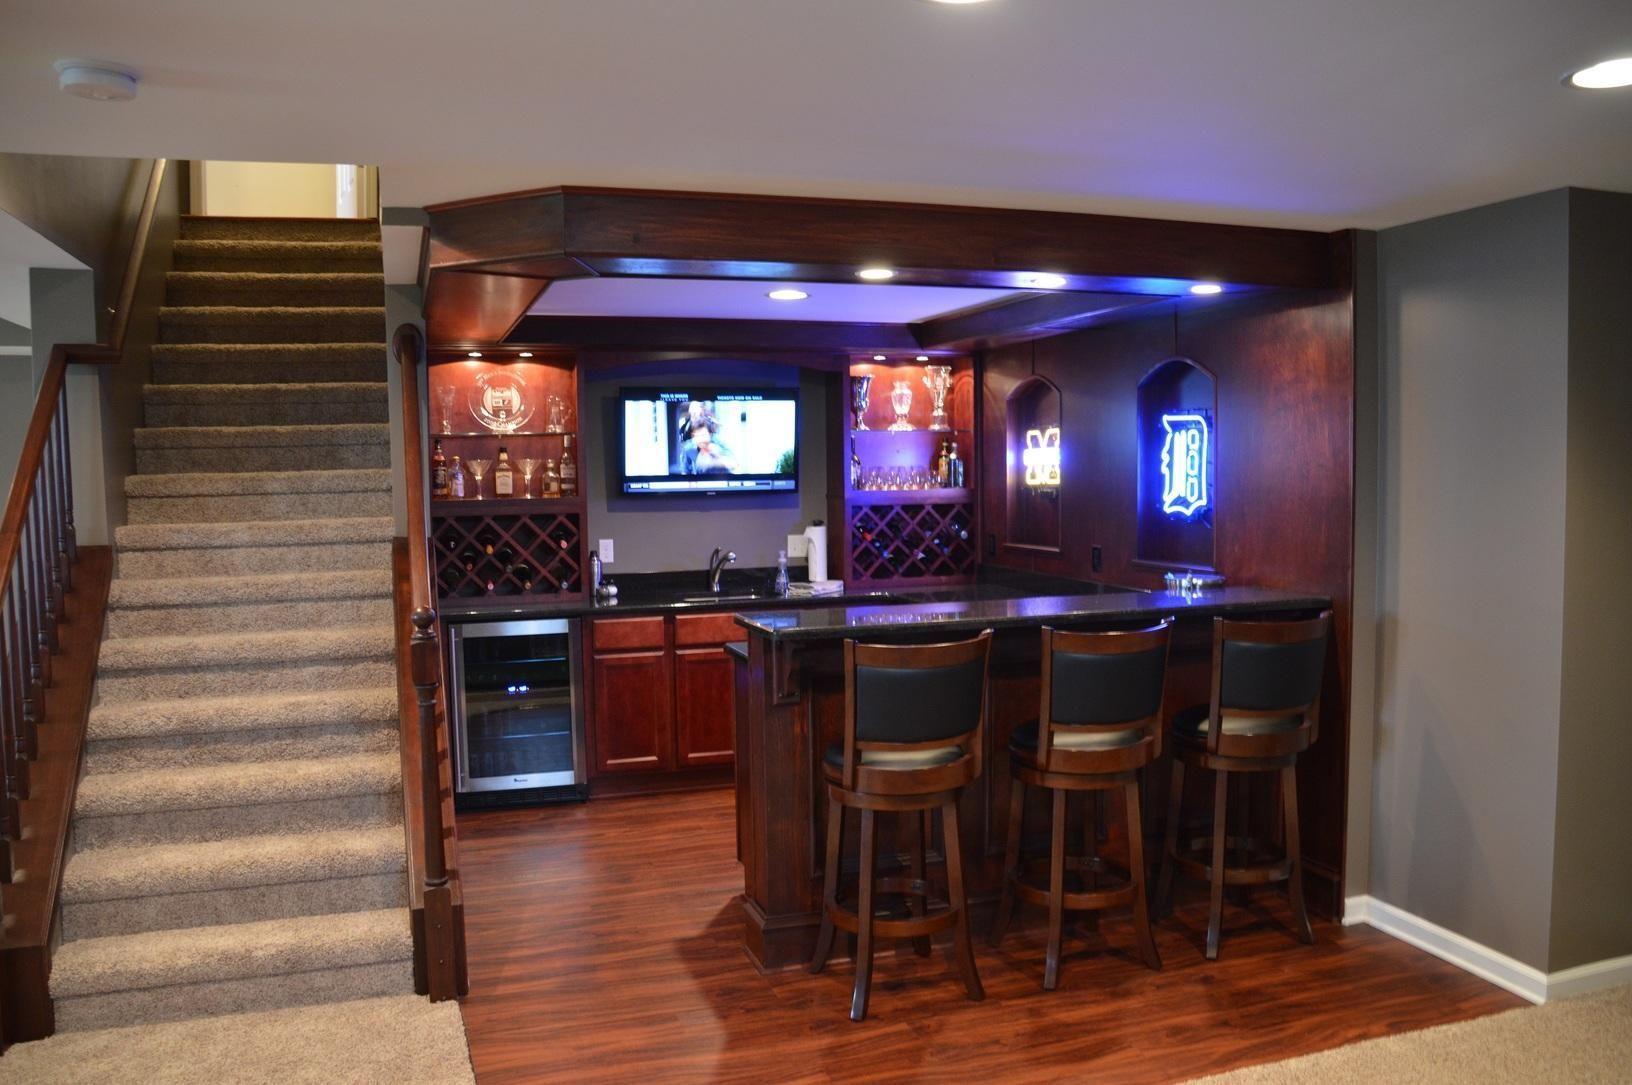 22+ Finished basement bar ideas ideas in 2021